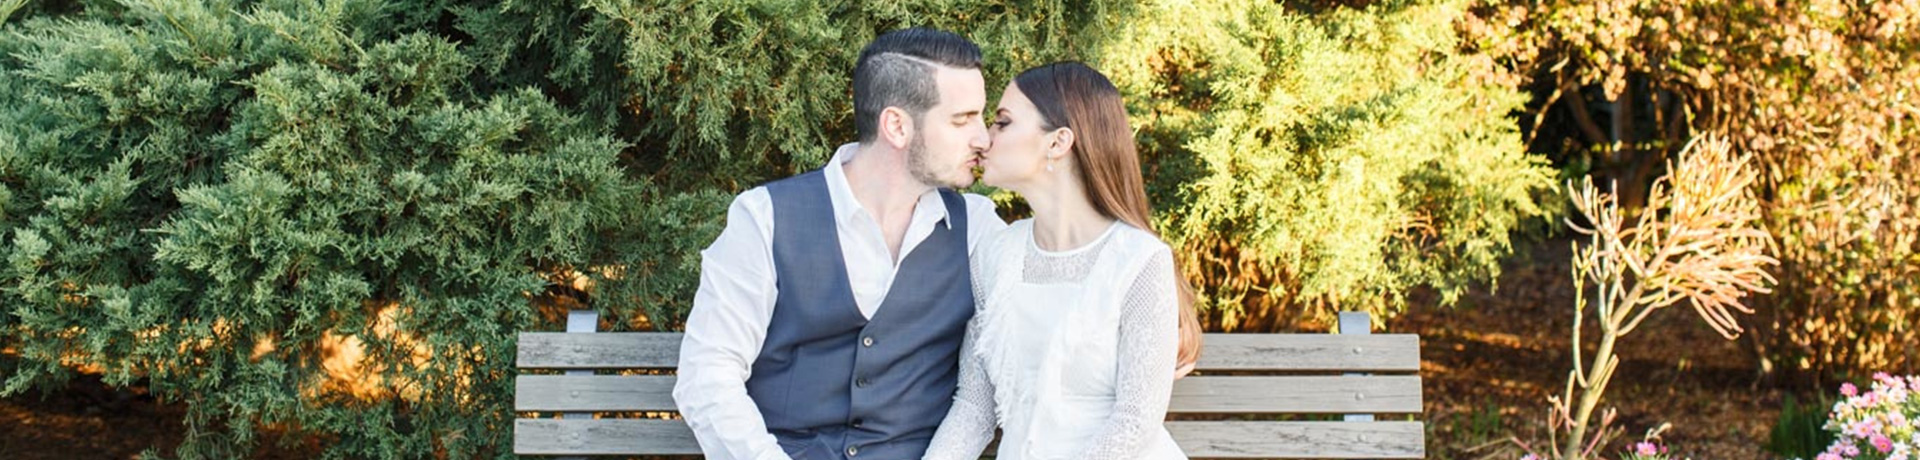 Daniel & Erika – Engagement Photos – Centennial Park Sydney